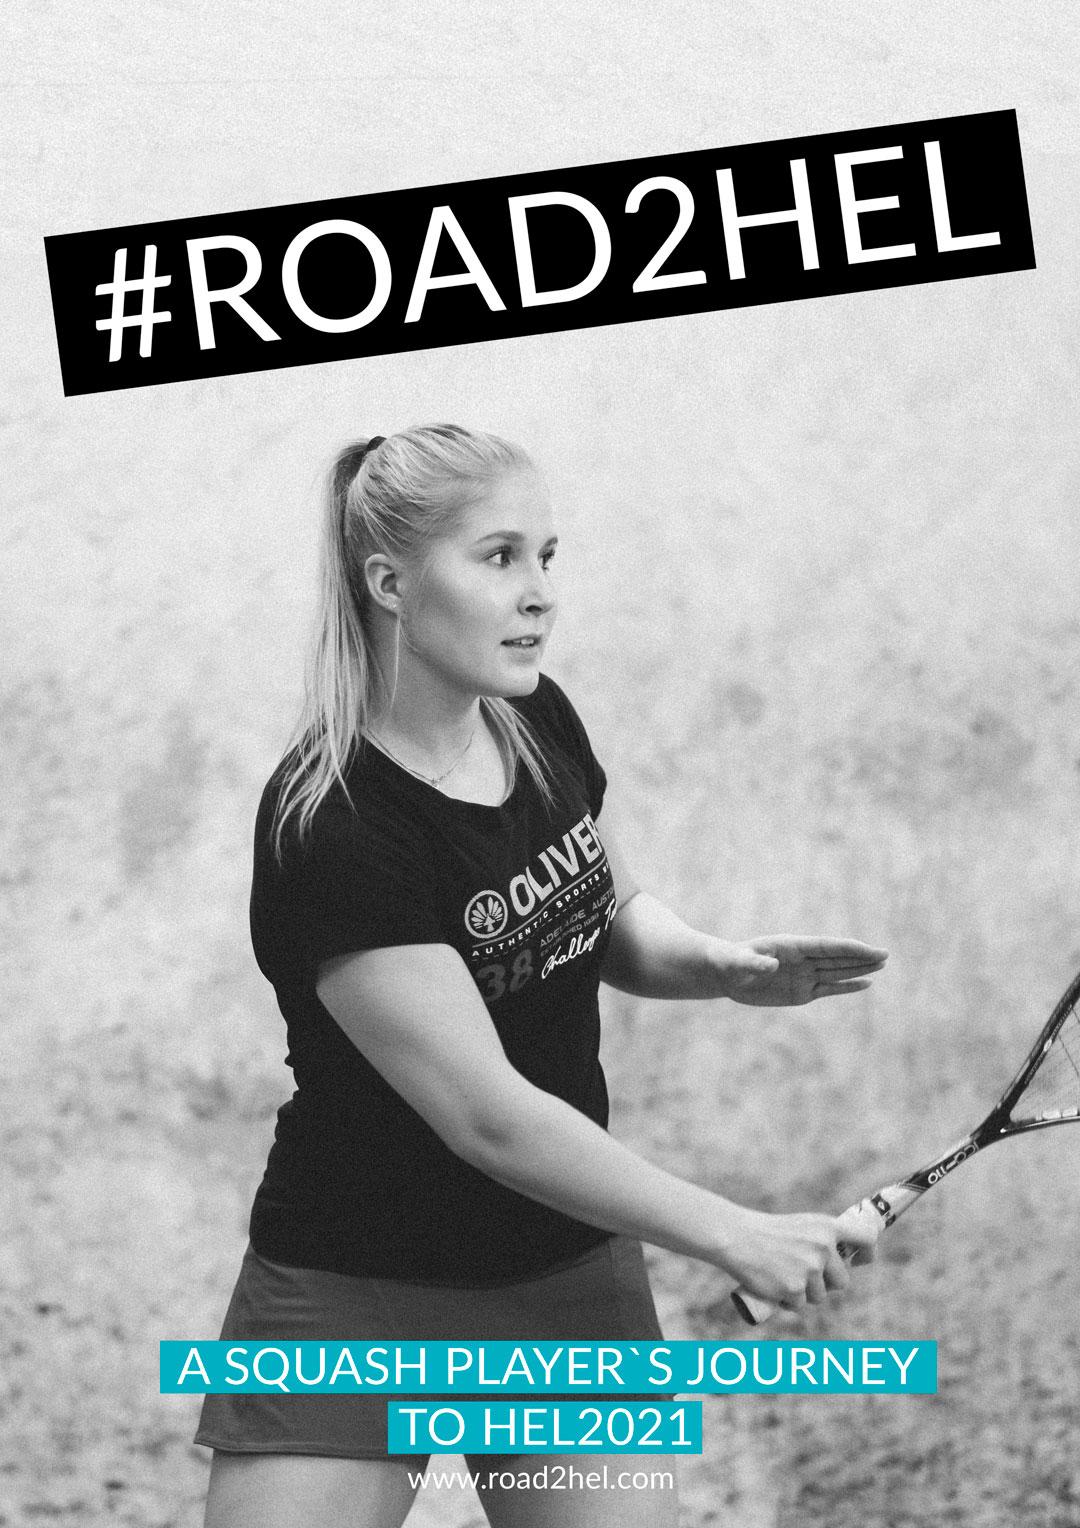 Riina_Koskinen_Squash_Player_Finland_road2hel